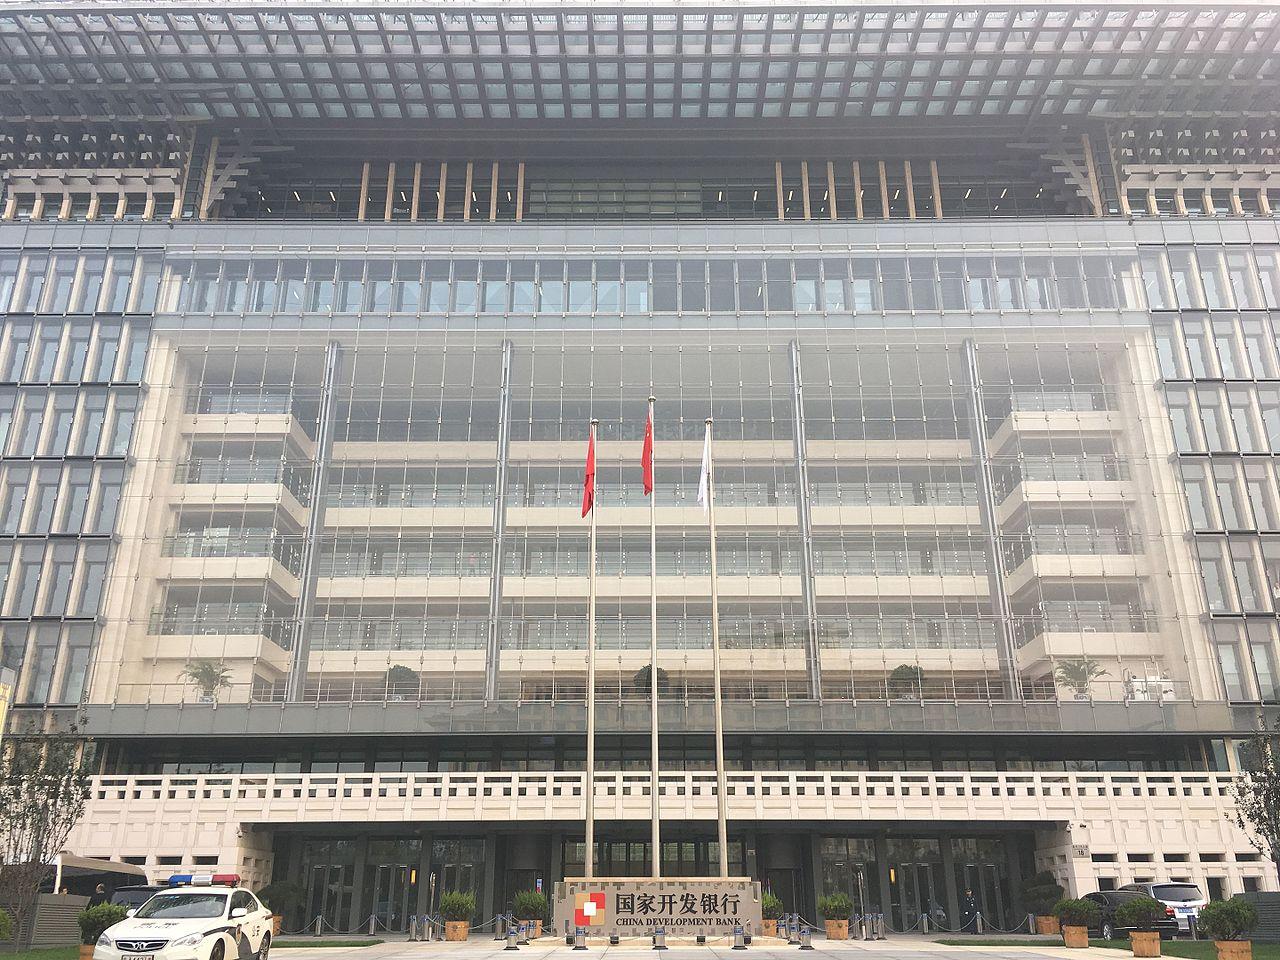 File:China Development Bank HQ, Beijing.jpg - Wikimedia Commons